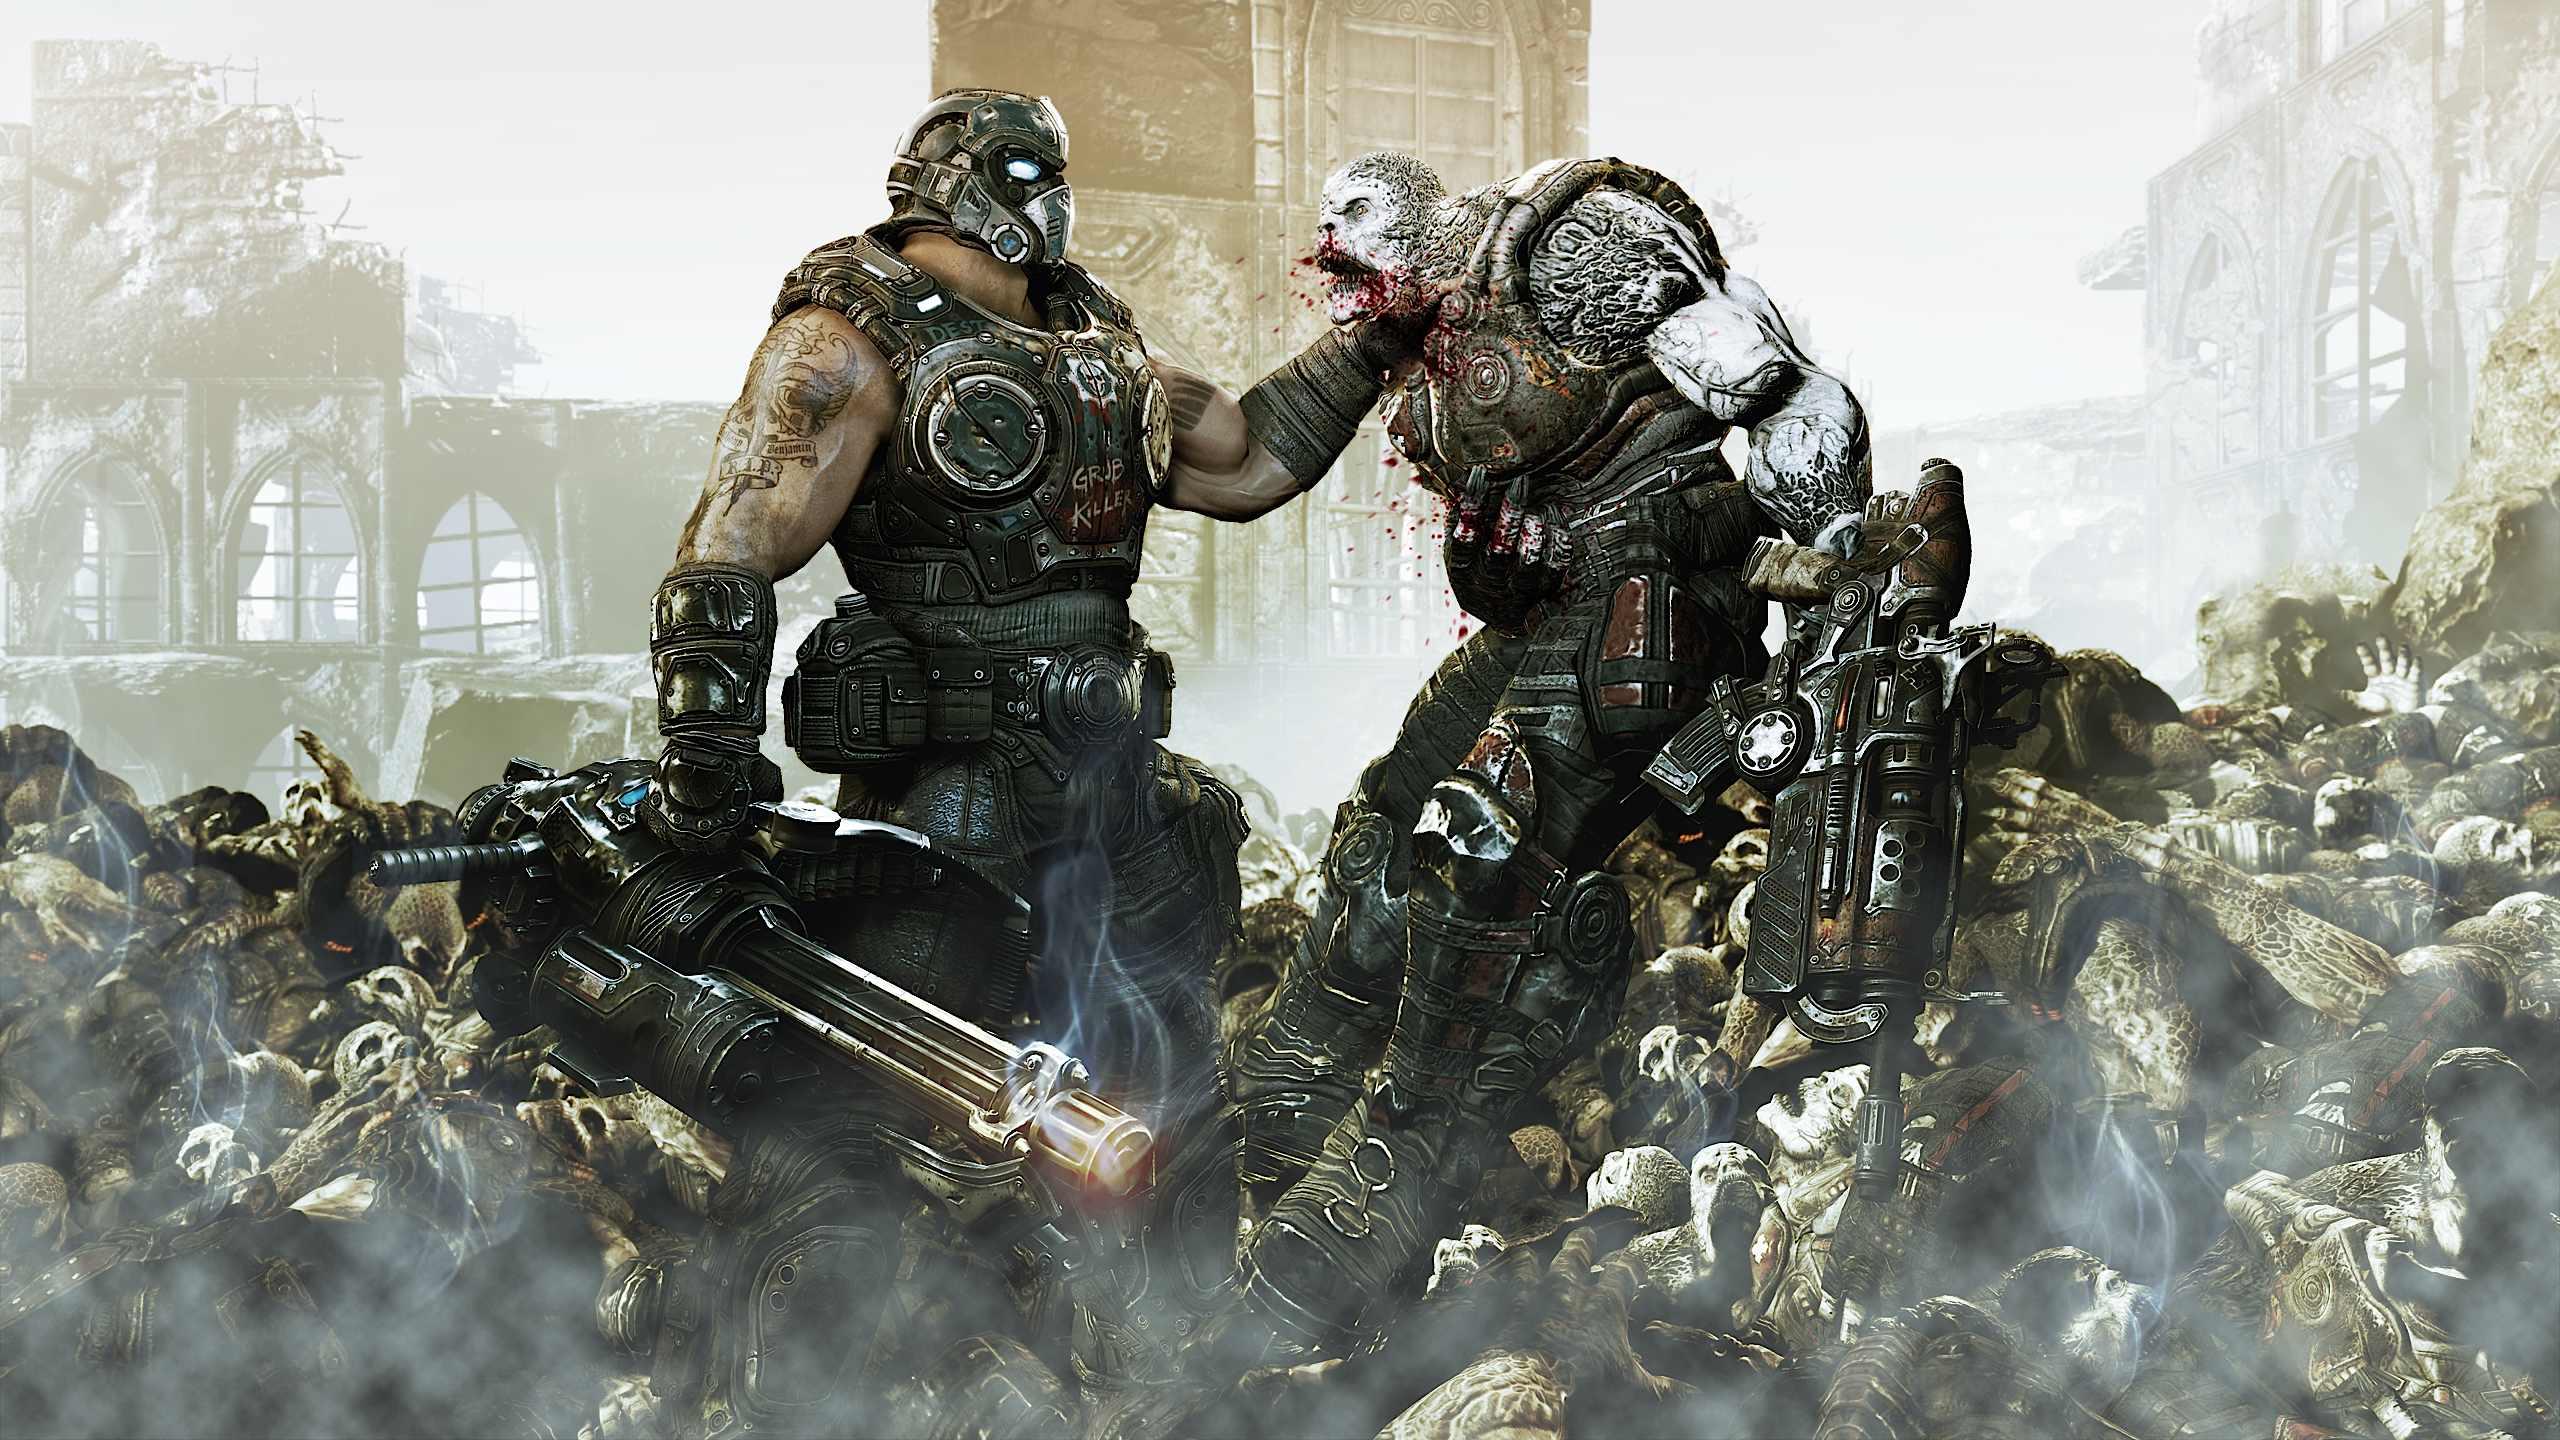 Gears of War 3 - Clayton Carmine